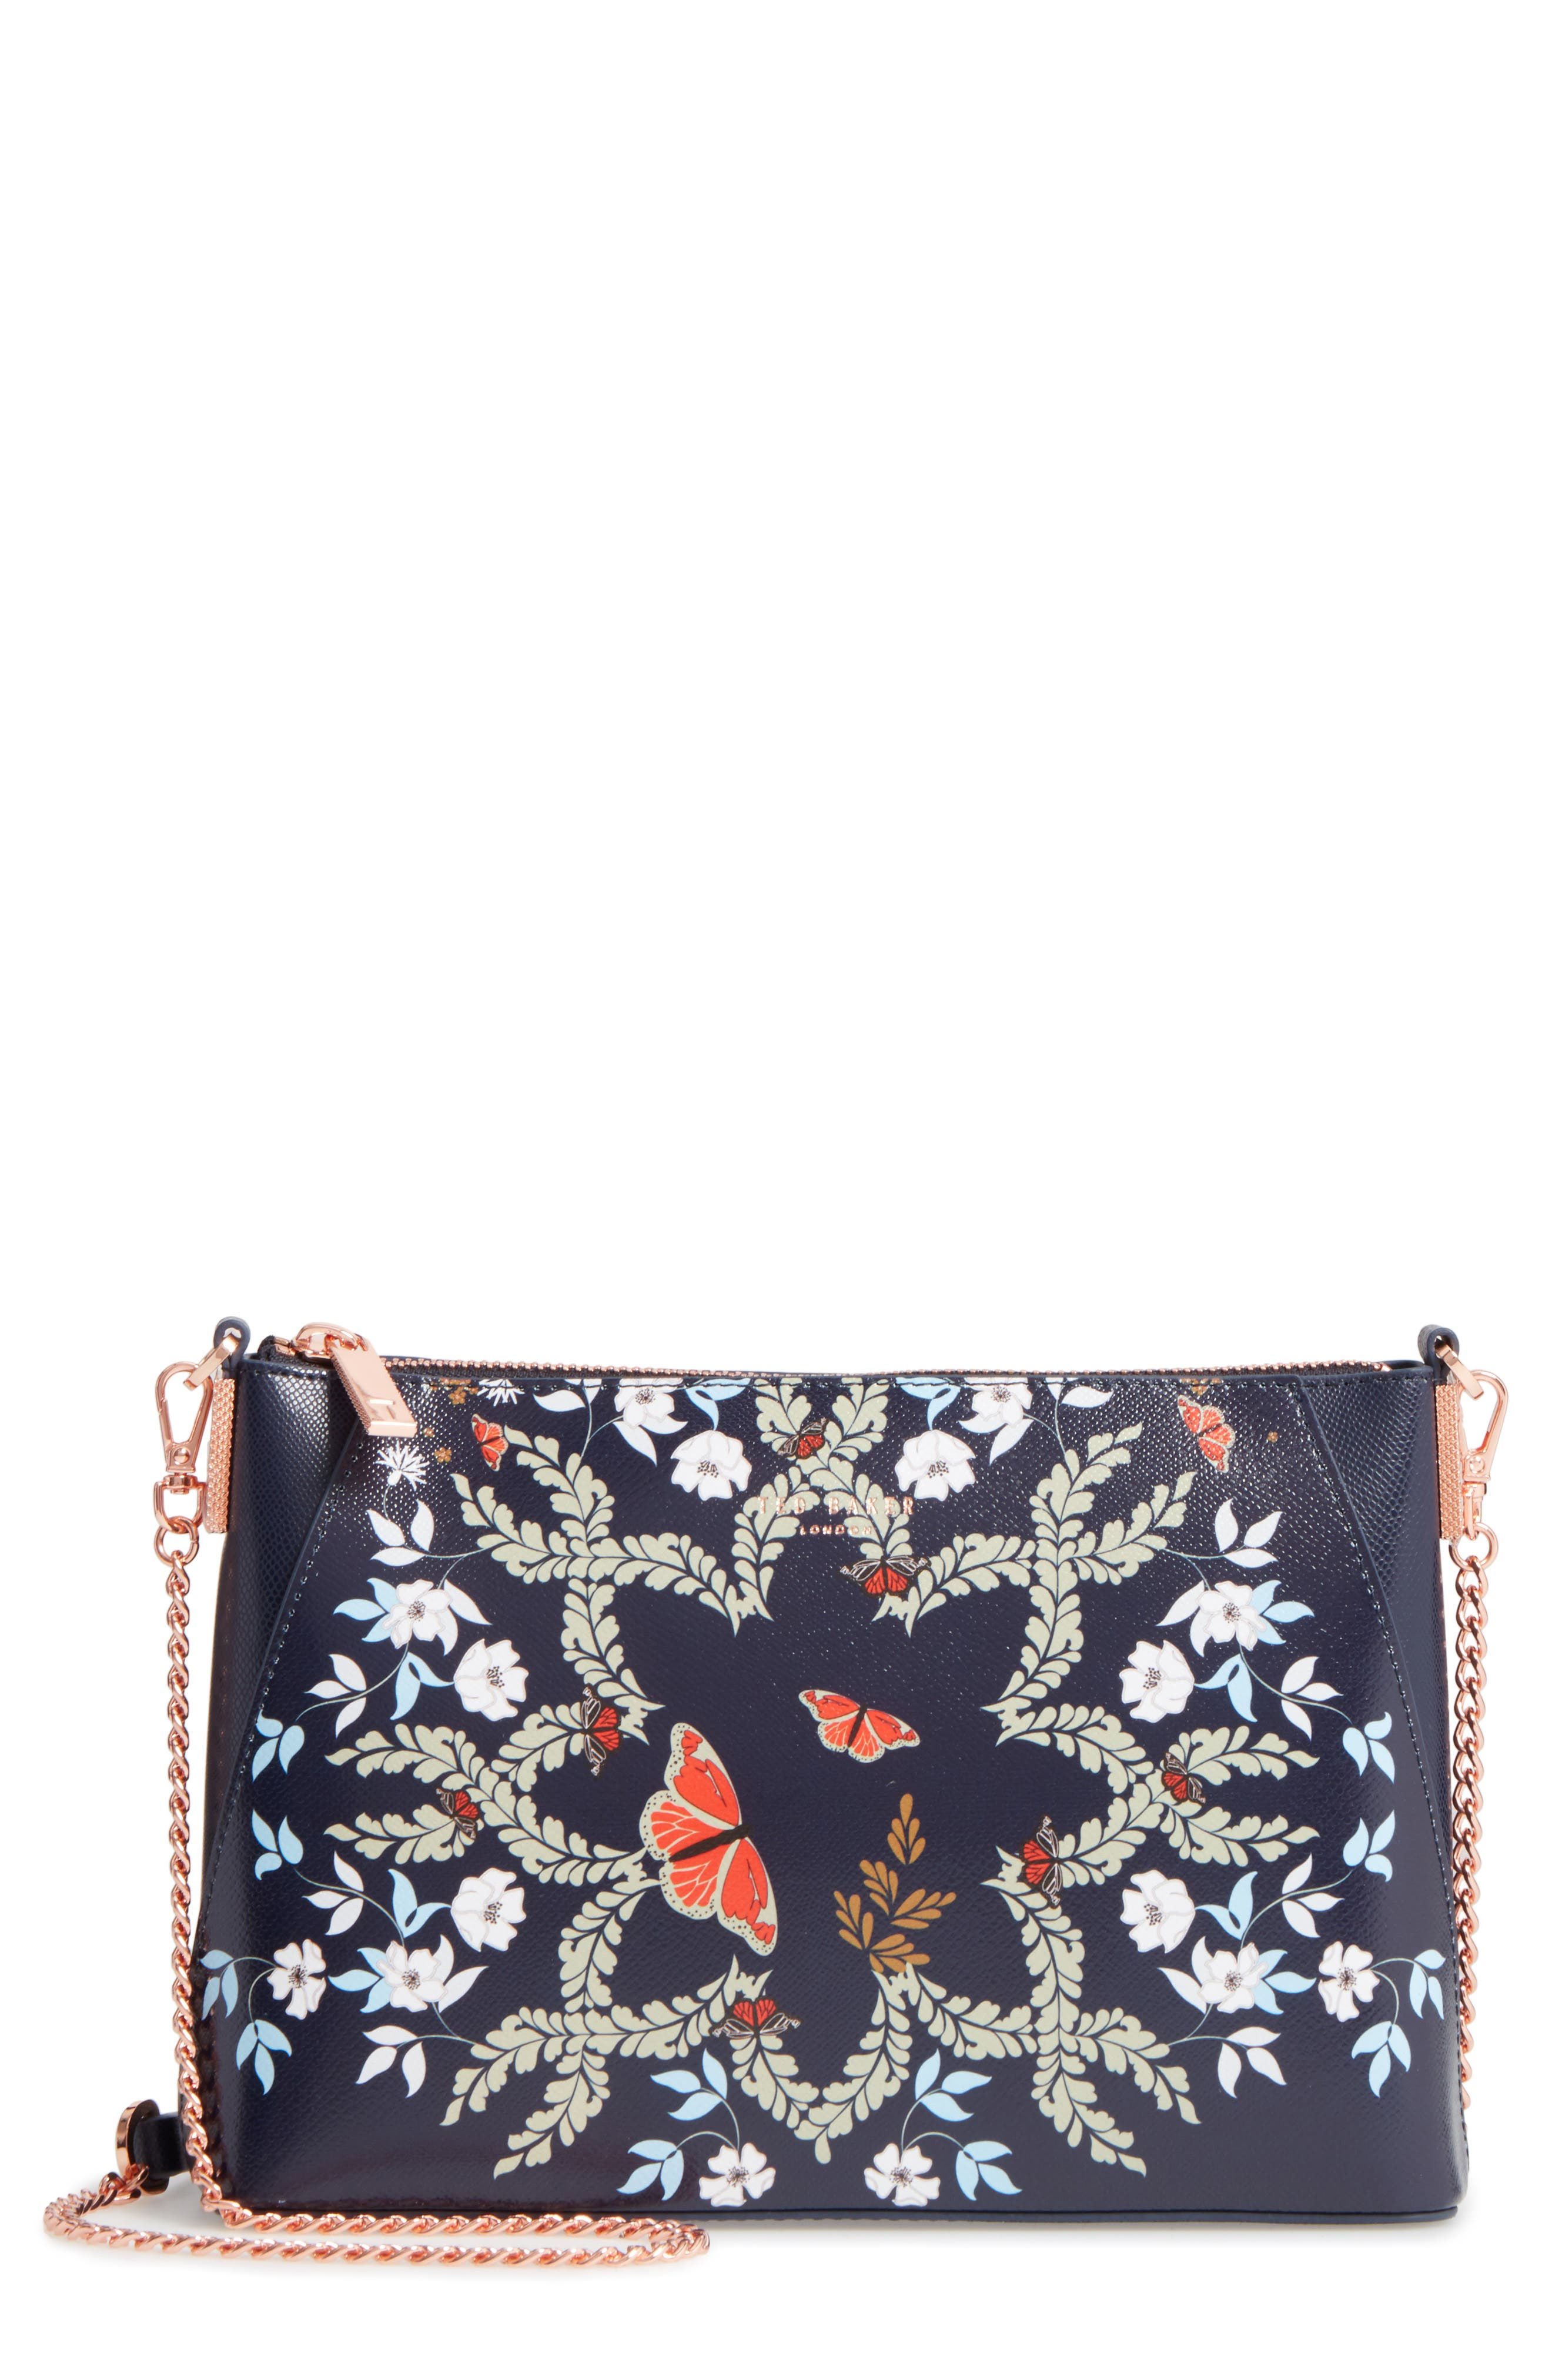 Marisiaa - Kyoto Gardens Leather Crossbody Bag,                             Main thumbnail 1, color,                             424